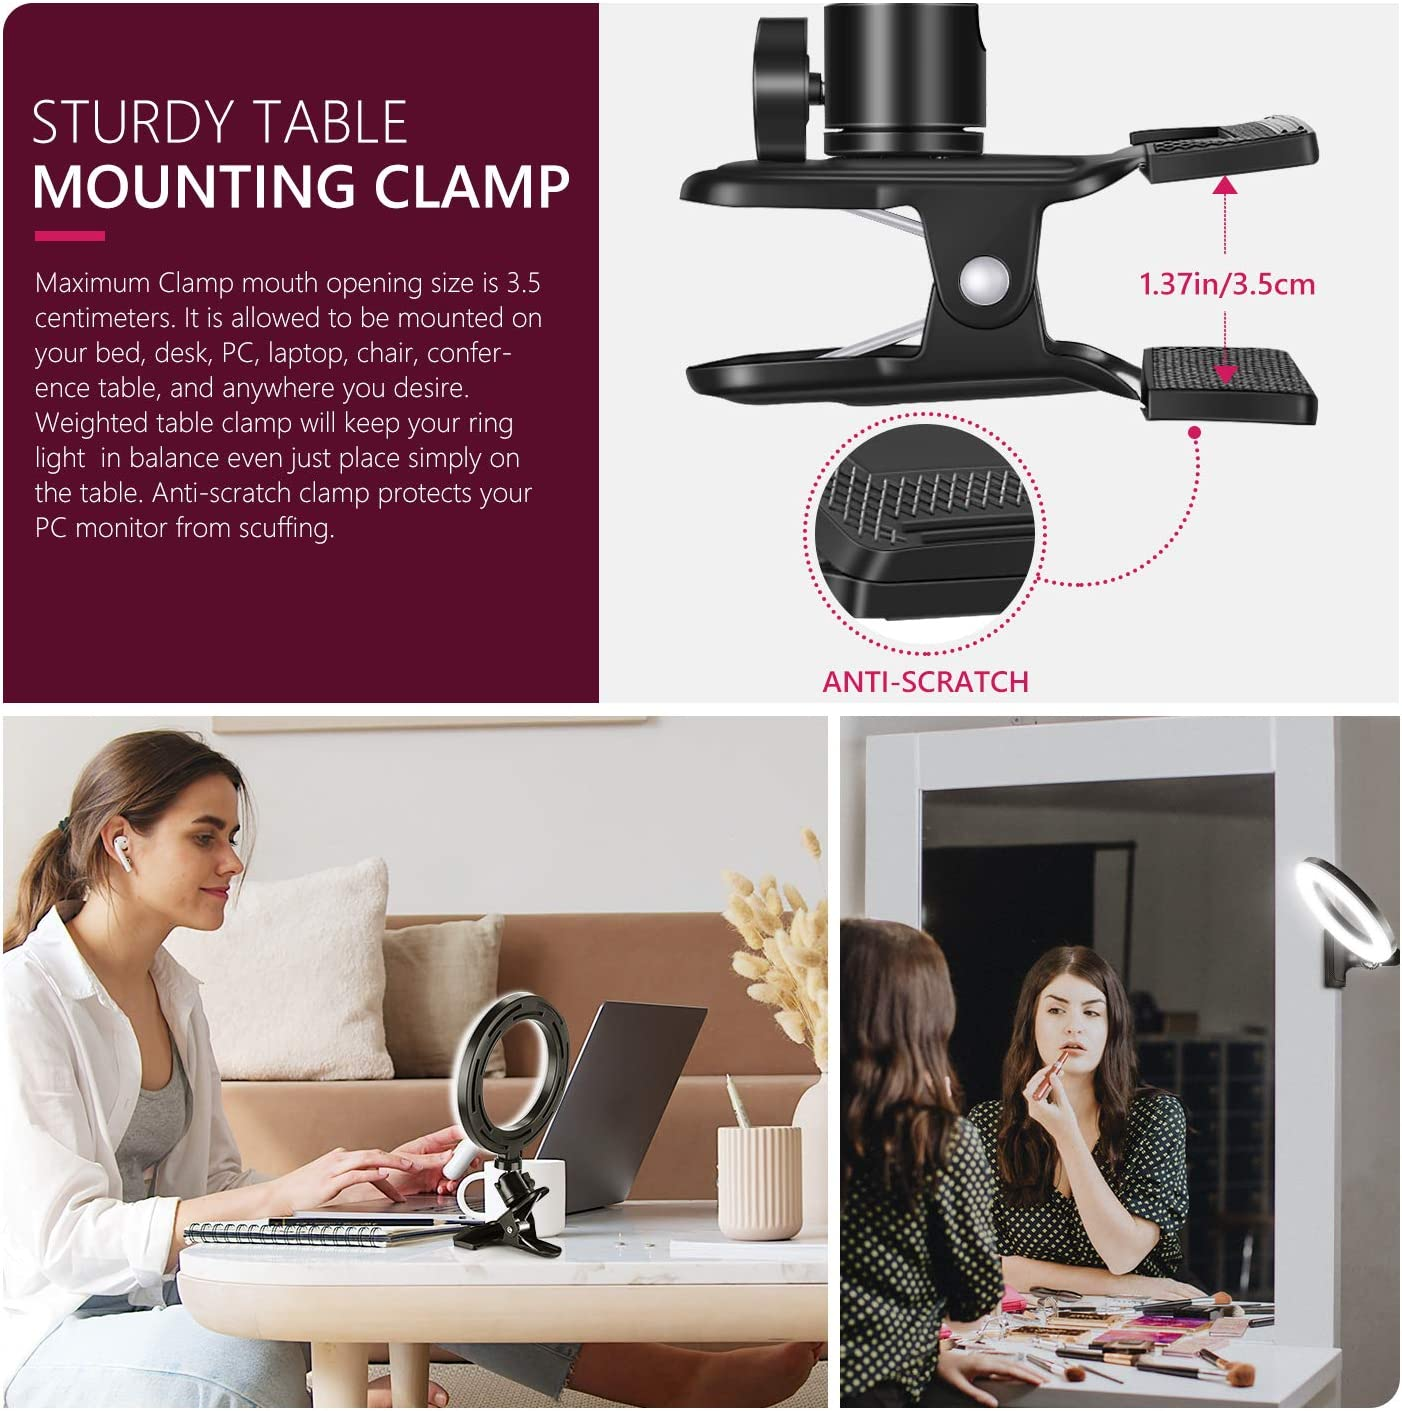 ART DNA 6-Inch USB Selfie Ring Light with Clamp Mount for PC Monitor//Desk Ring Light for Game Live Stream TIK Tok YouTube Webcam Light 3 Light Modes 360/° Rotatable 11-Level Dimmable